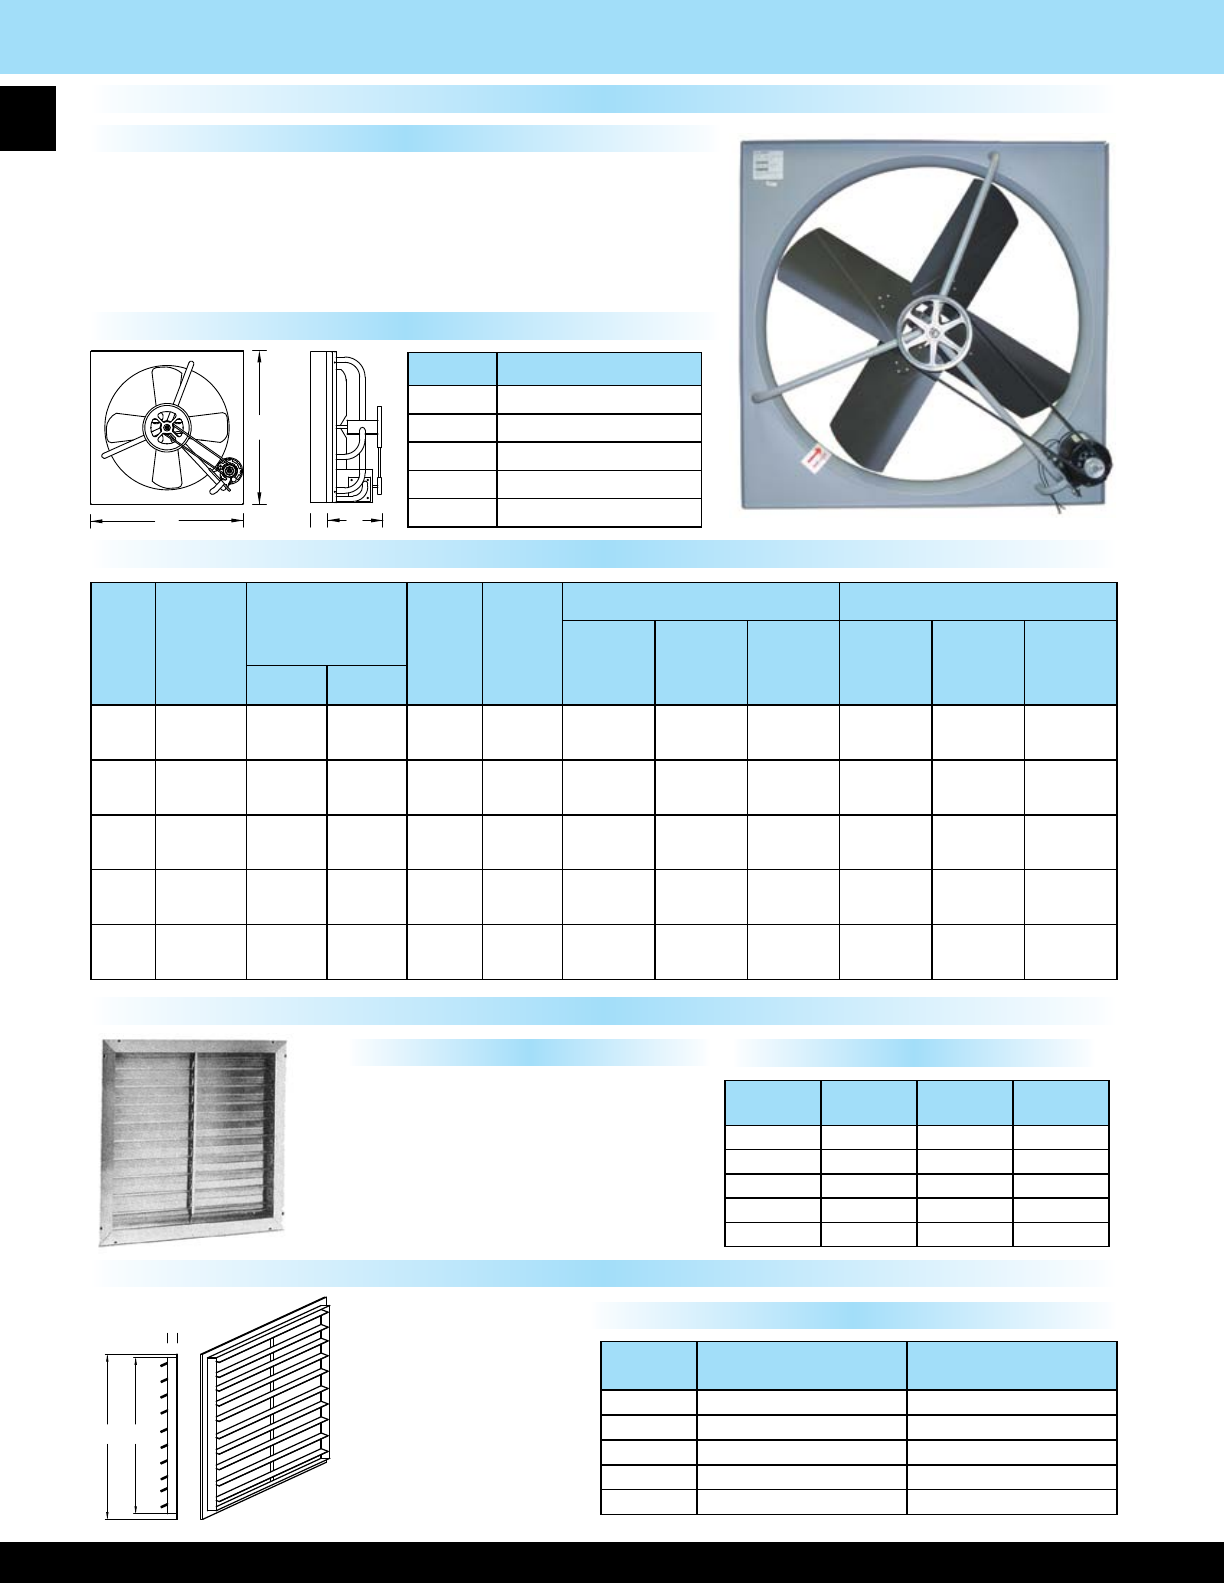 30 Diameter TPI Corporation HDH-30-G Heavy Duty Industrial Circulator Head Single Phase 120 Volt 30 Diameter HDH30G